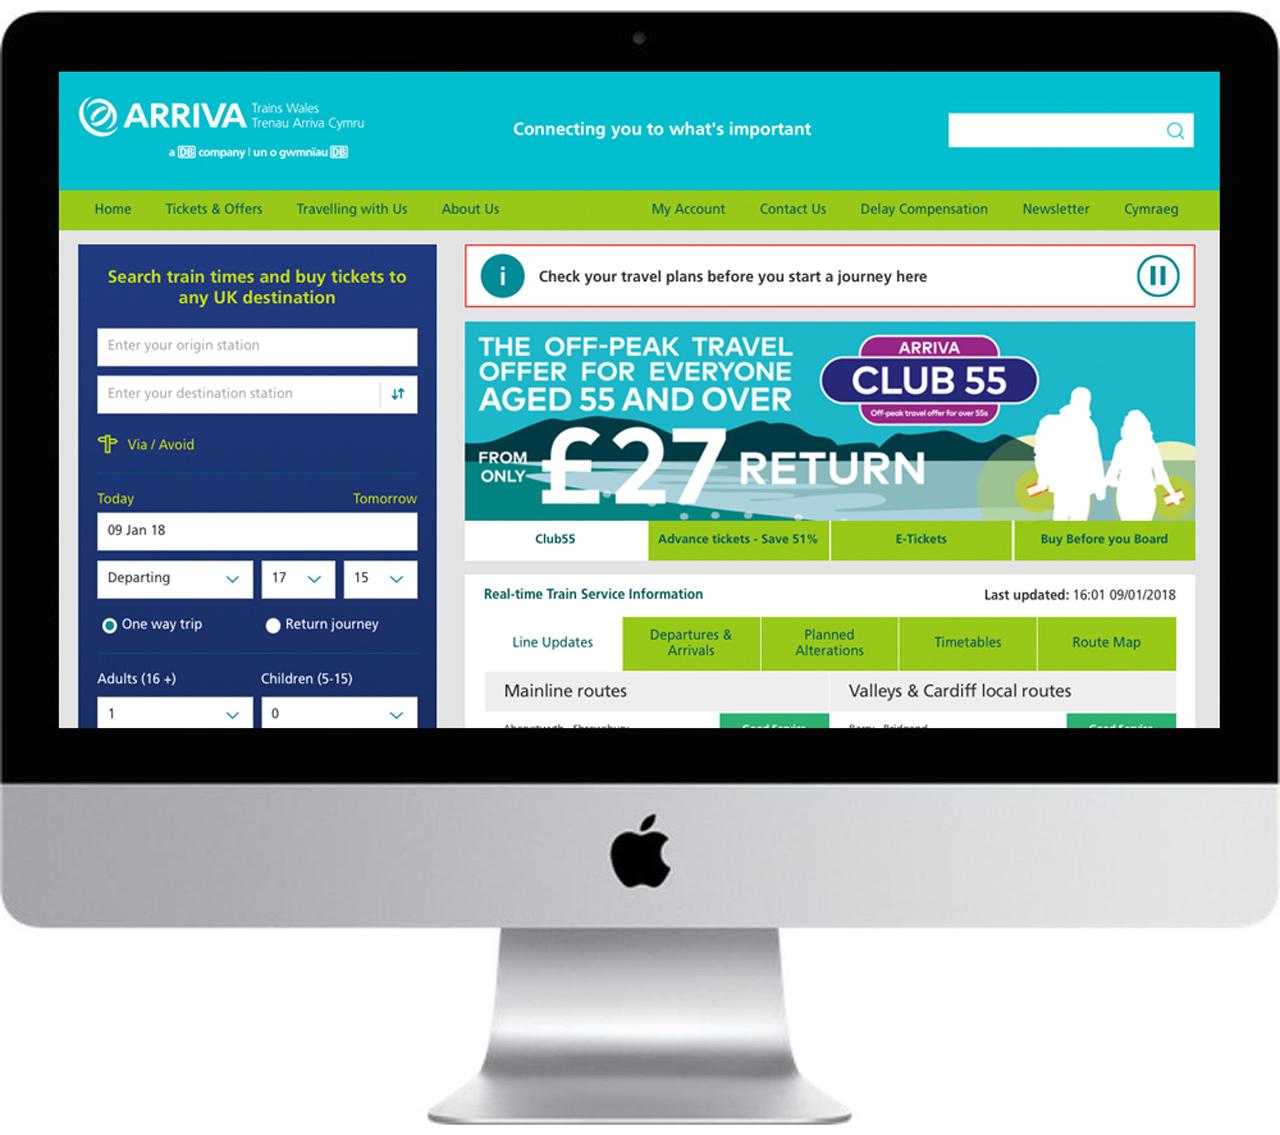 website showing banner advertising